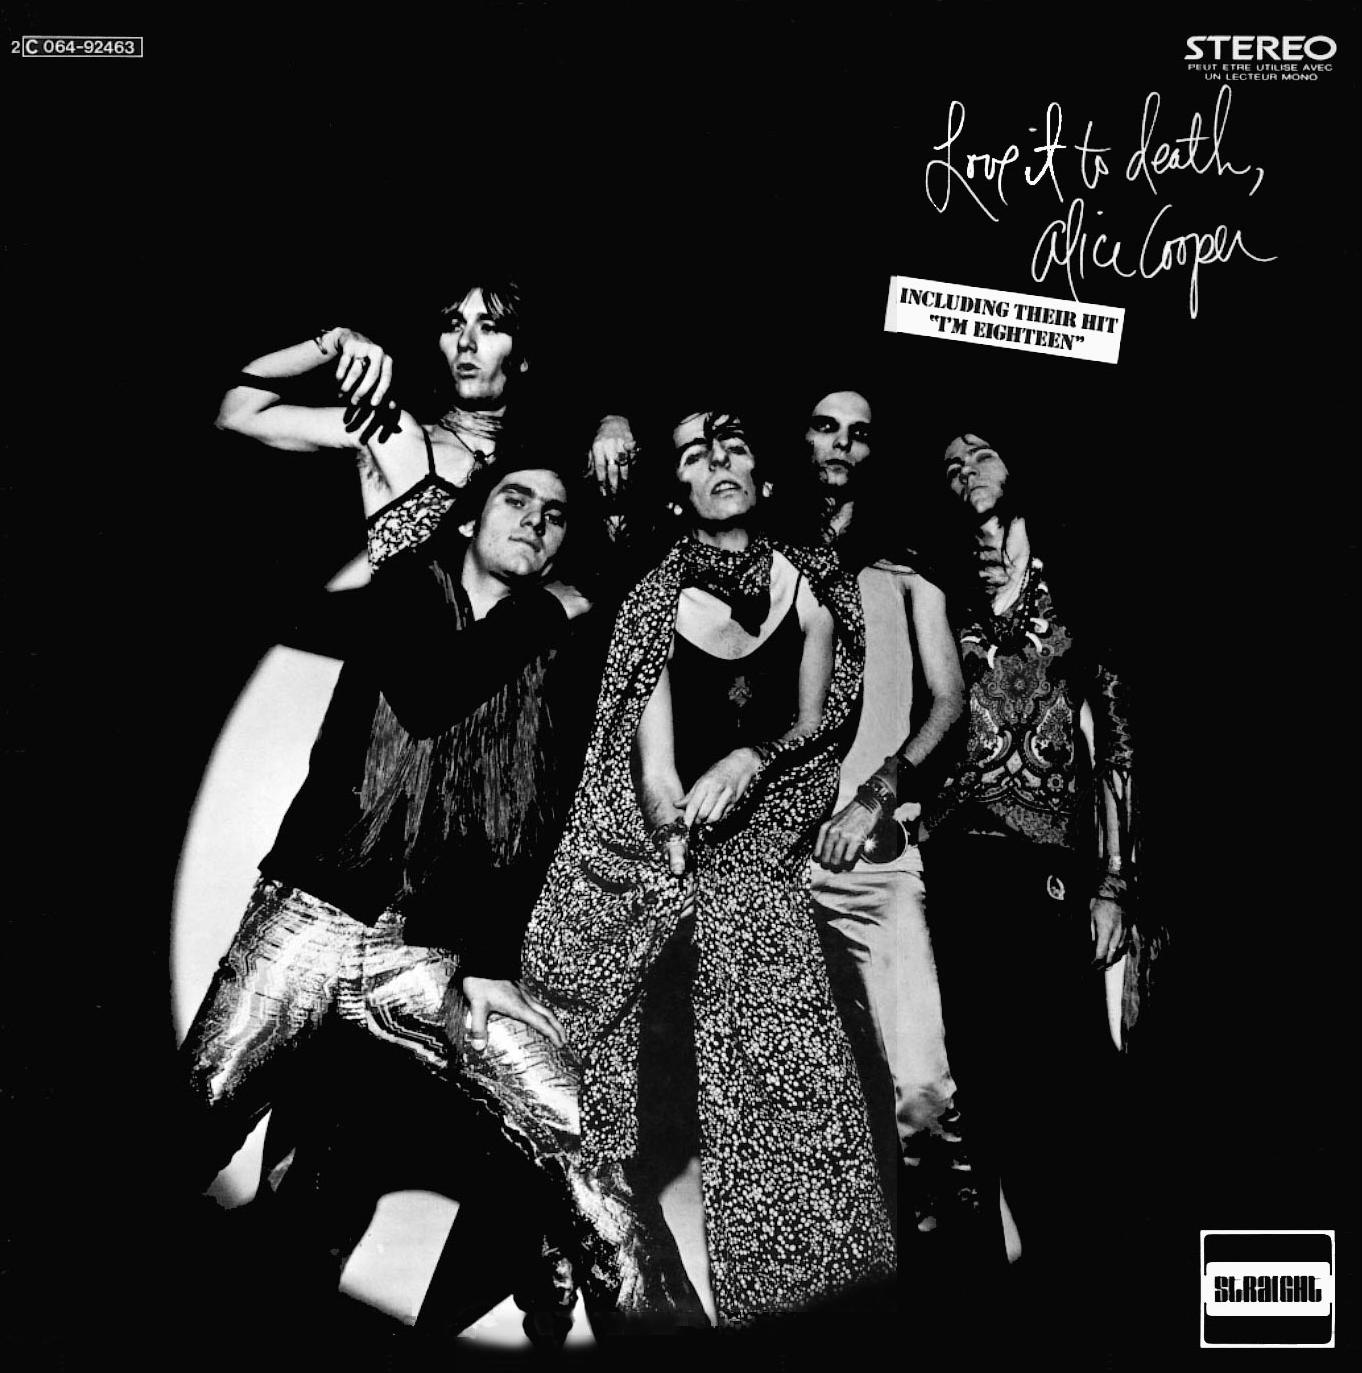 Alice Cooper - Love It to Death - album cover